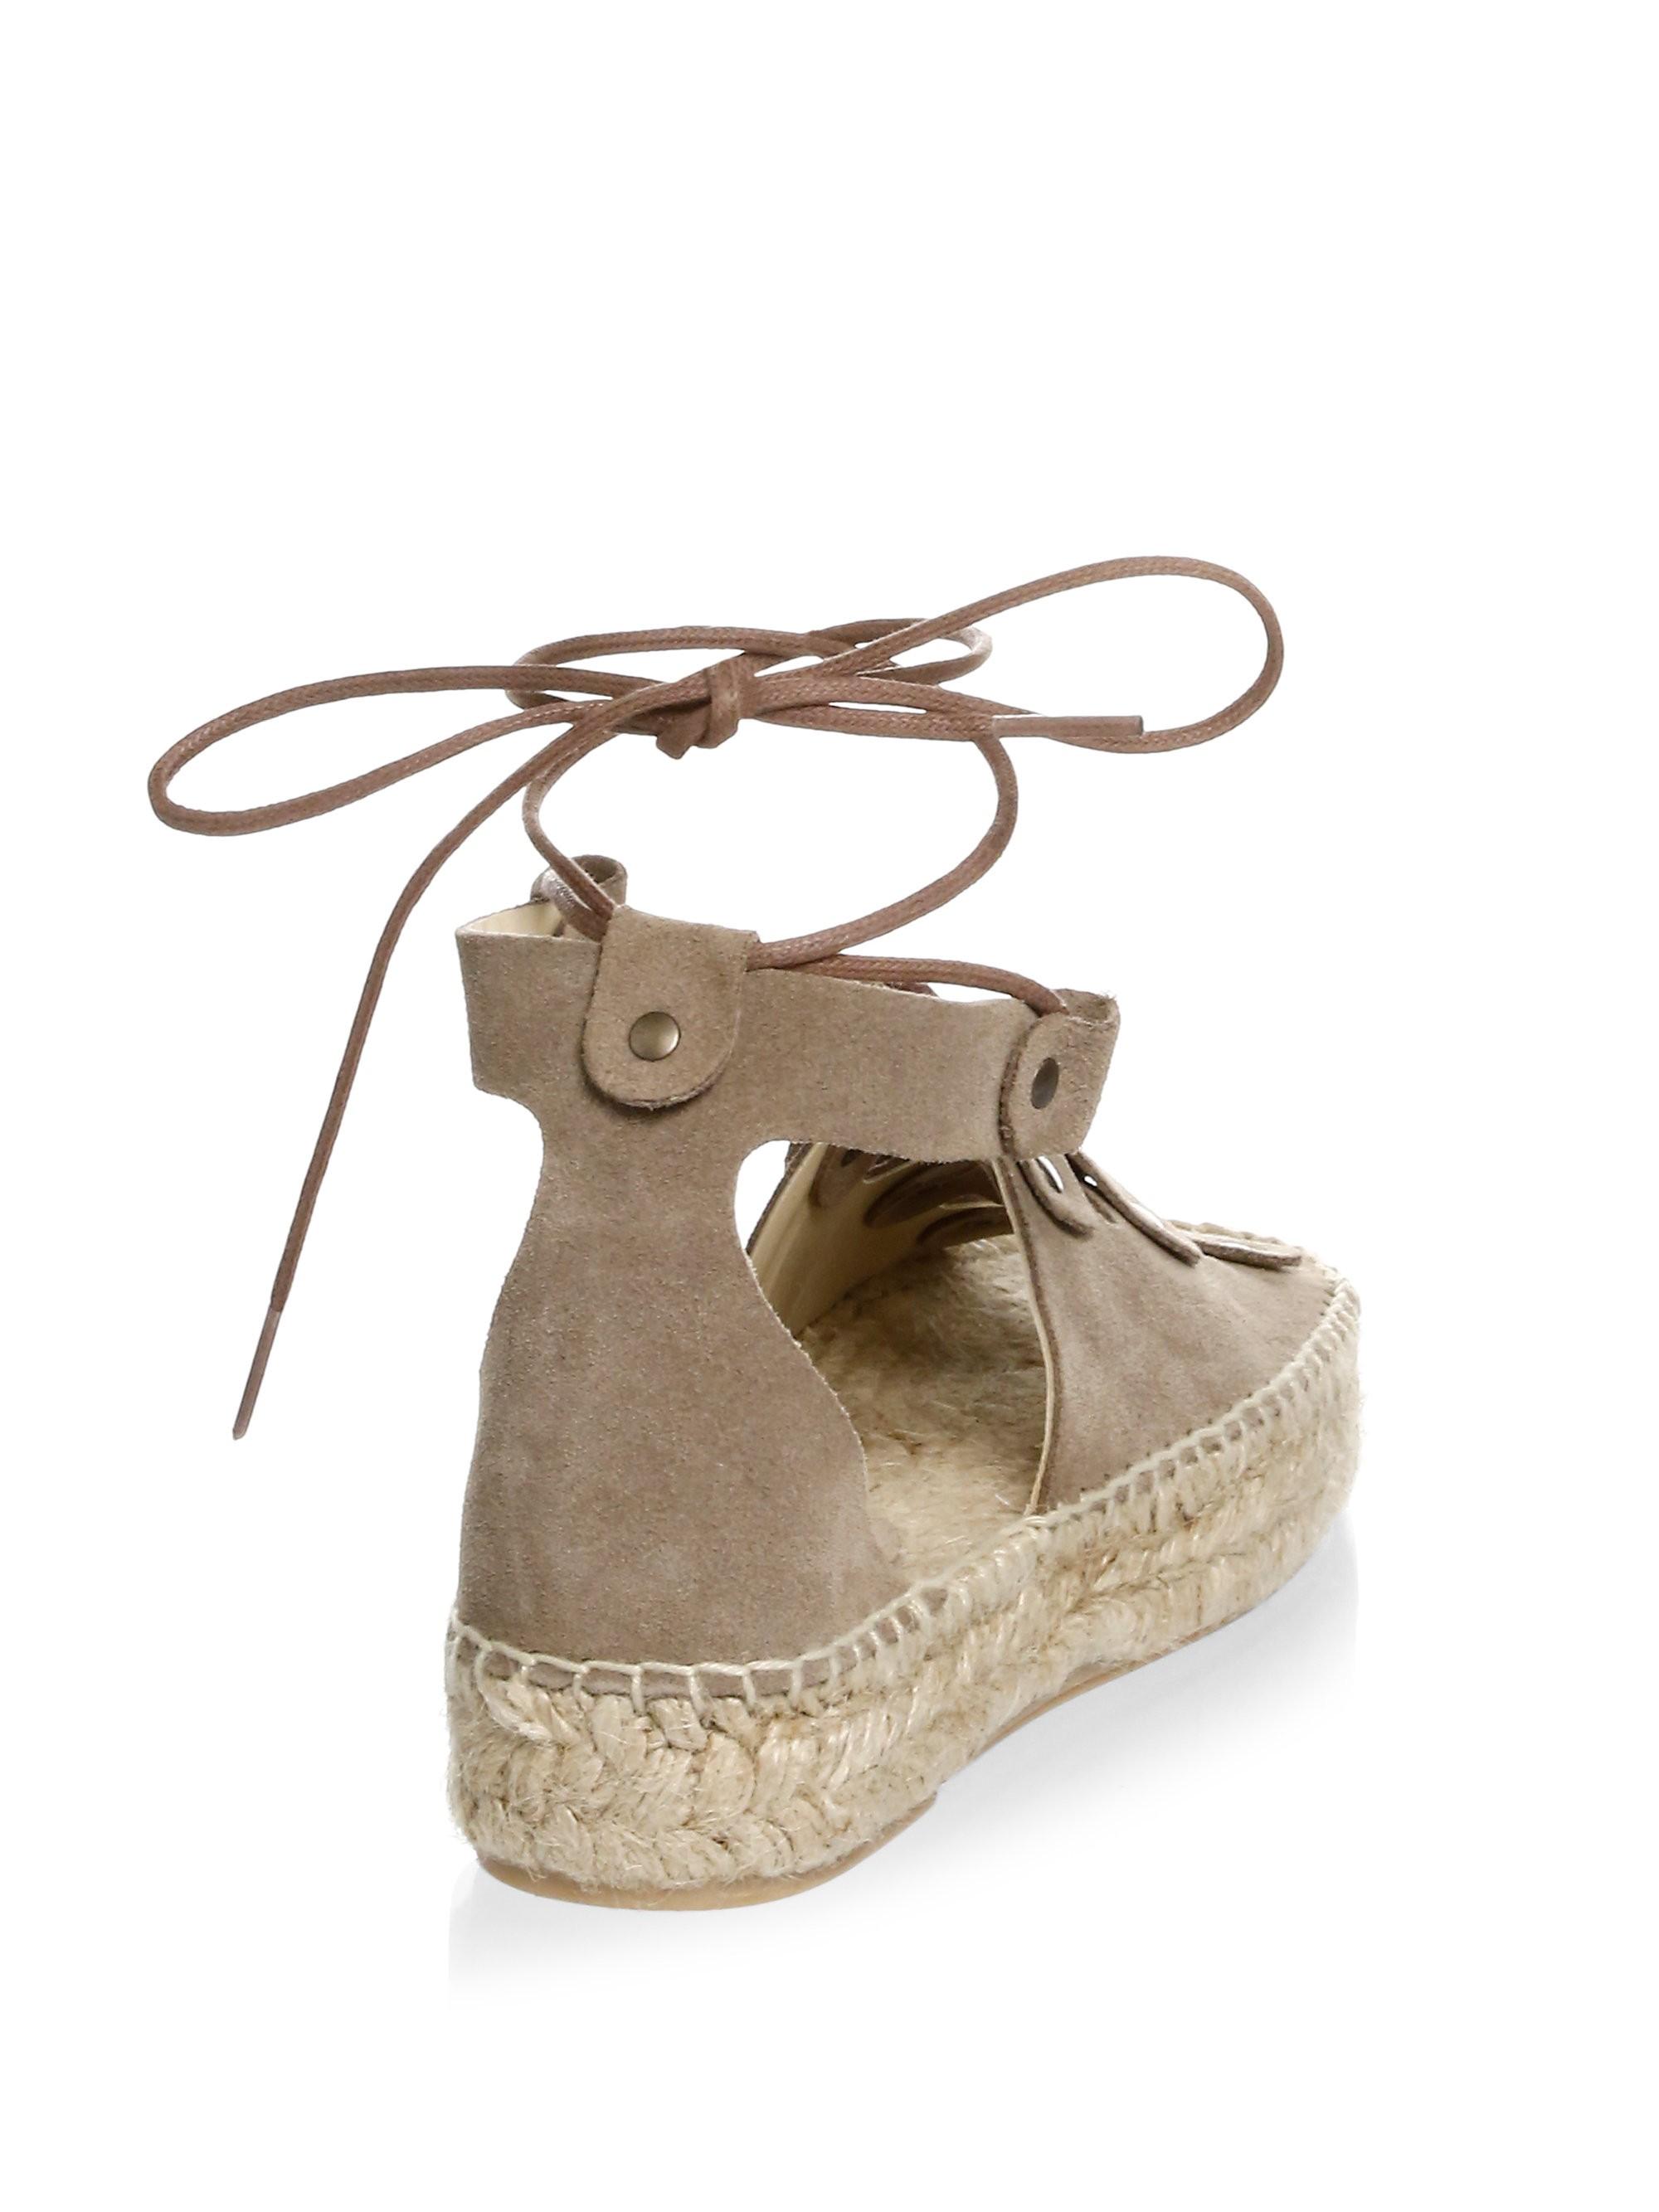 5c3b2861949 Soludos Ghillie Suede Platform Espadrille Sandals - Dove Grey 10